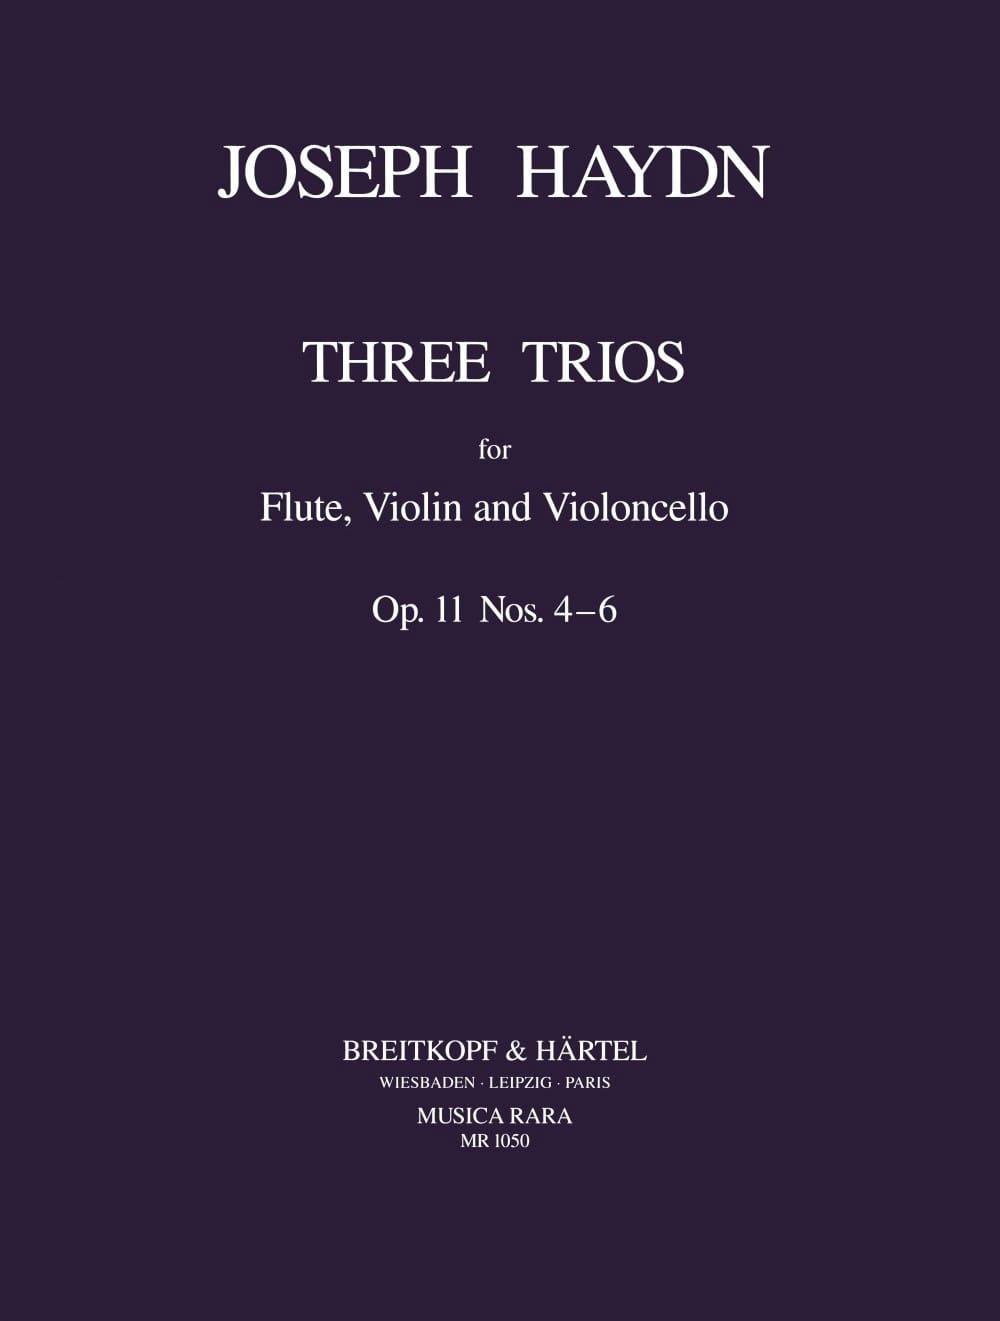 HAYDN - 3 Trios op. 11 No. 4-6 - Flute Violine Violonc. - Stimmen - Partition - di-arezzo.com